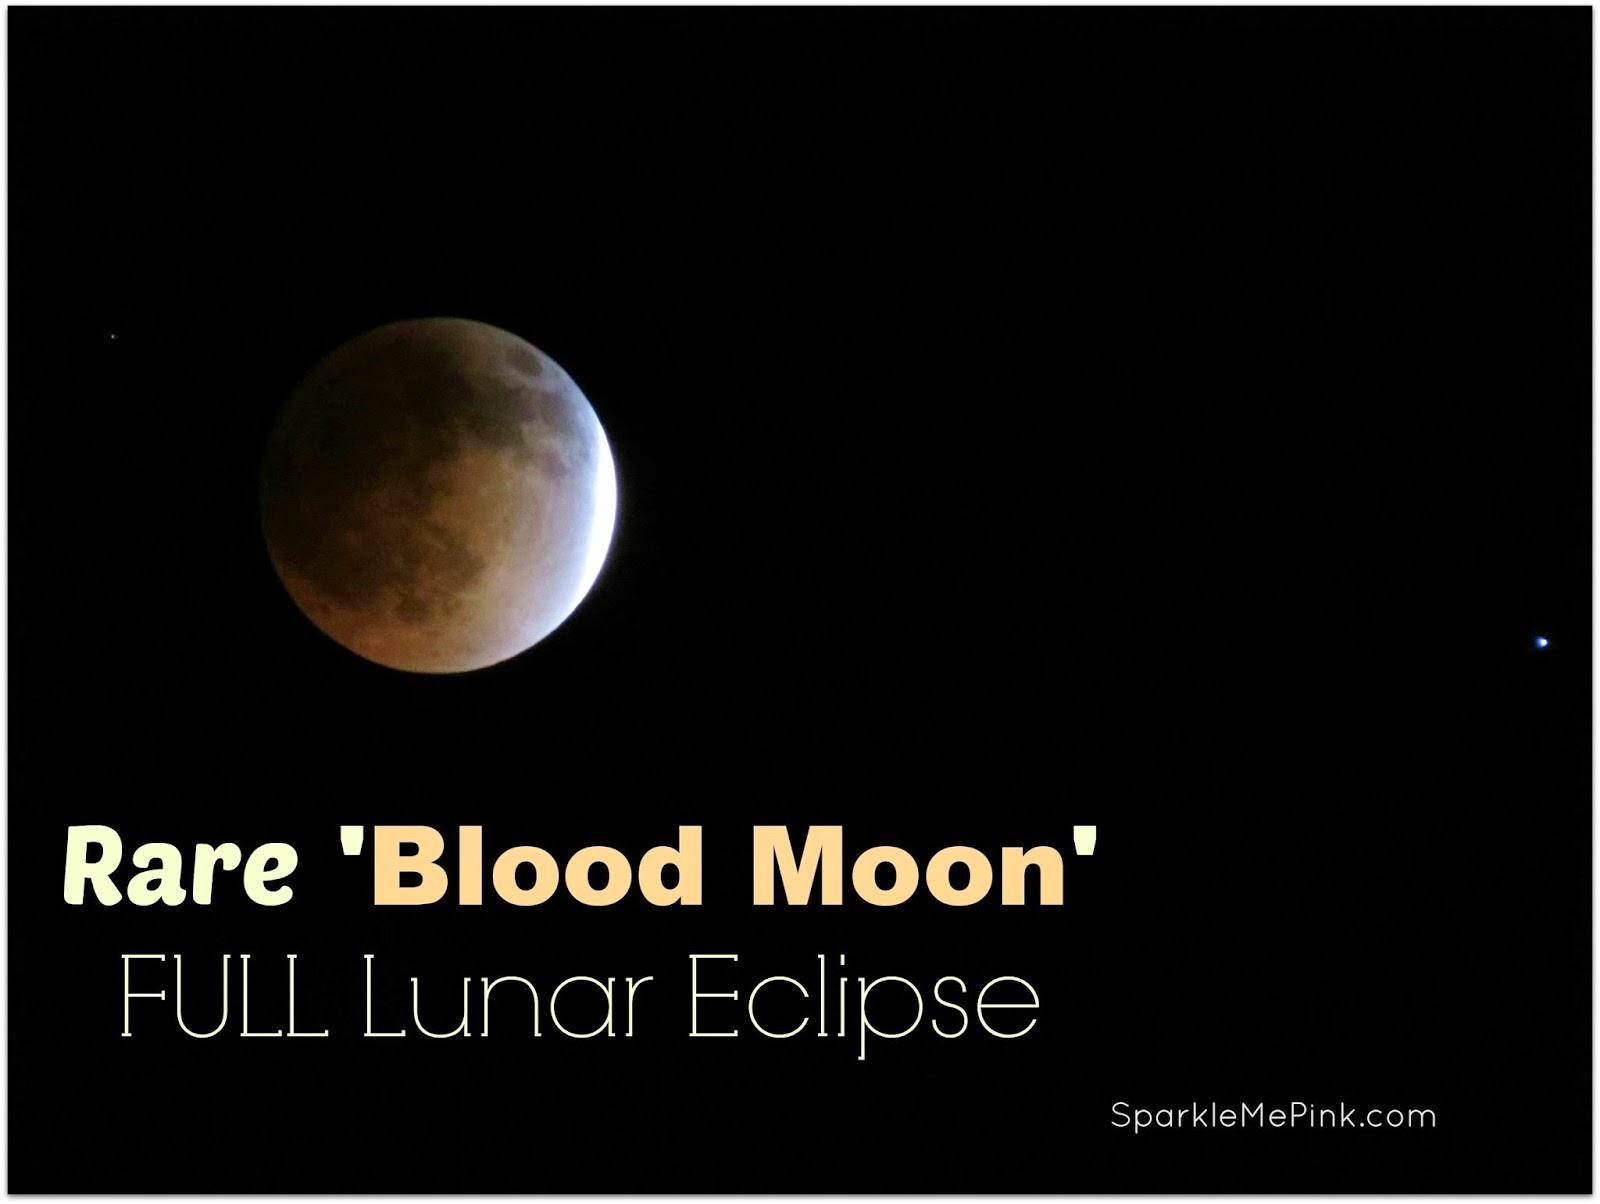 blood moon rare eclipse - photo #16